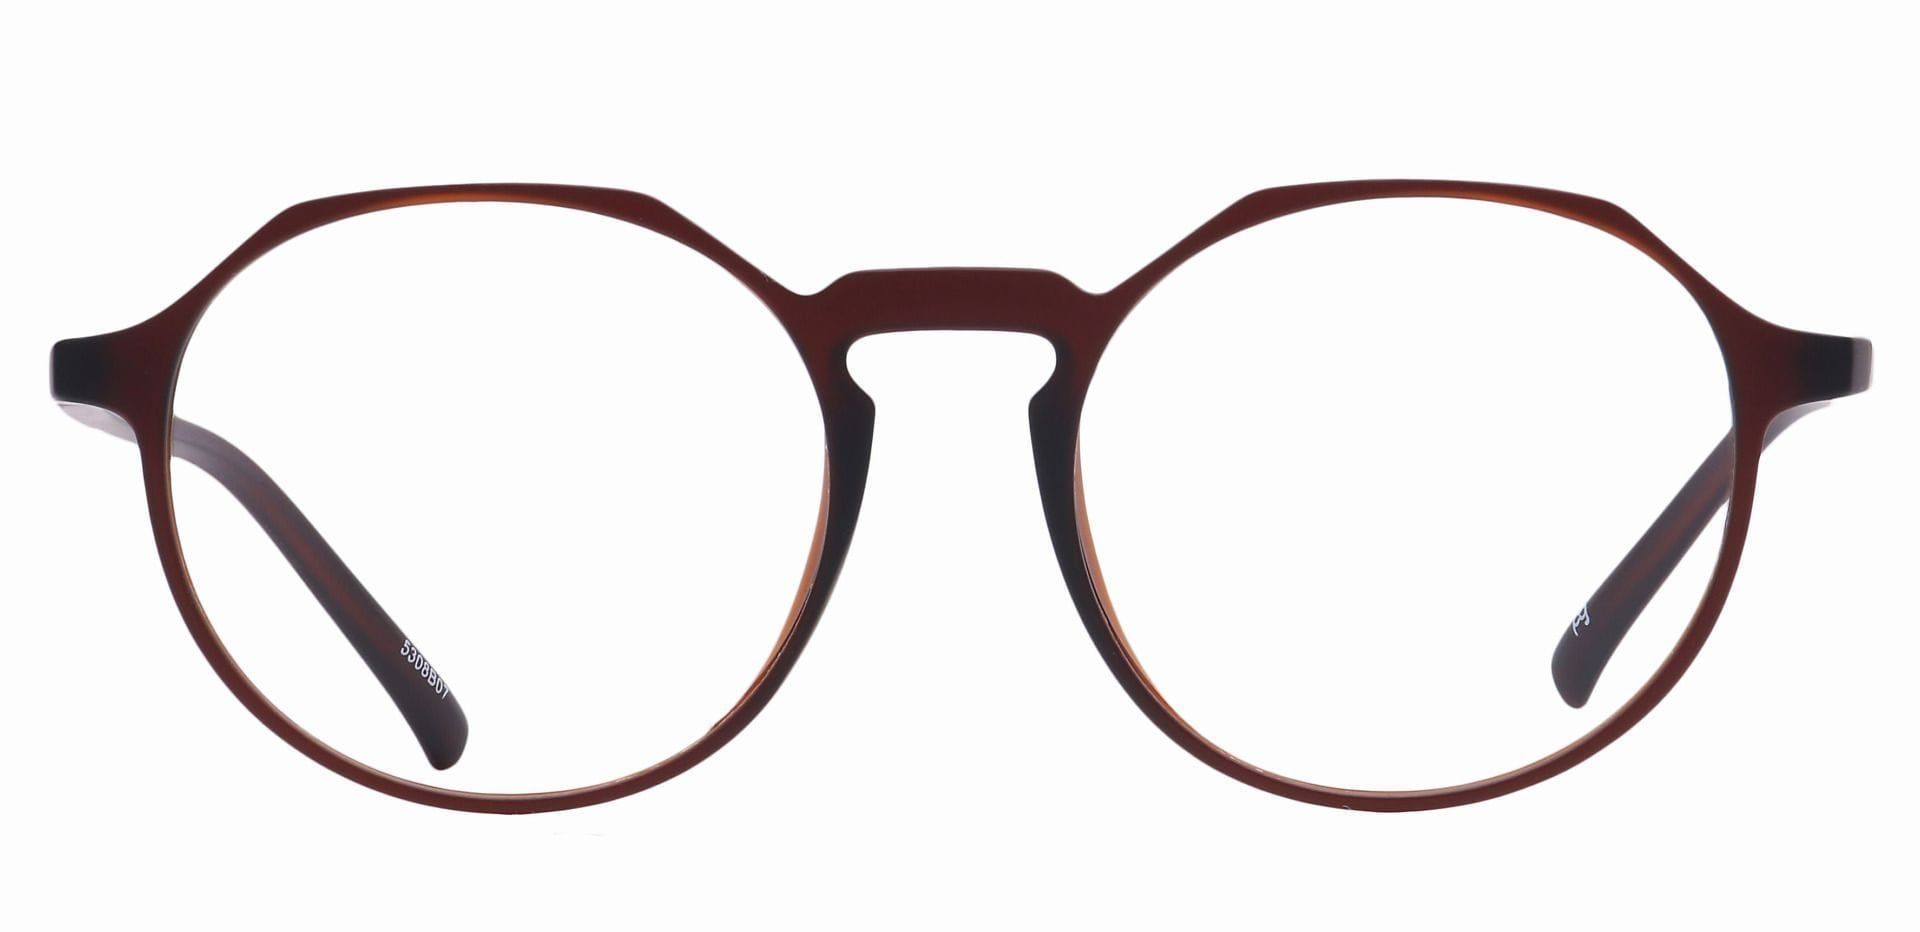 Paragon Oval Non-Rx Glasses - Brown